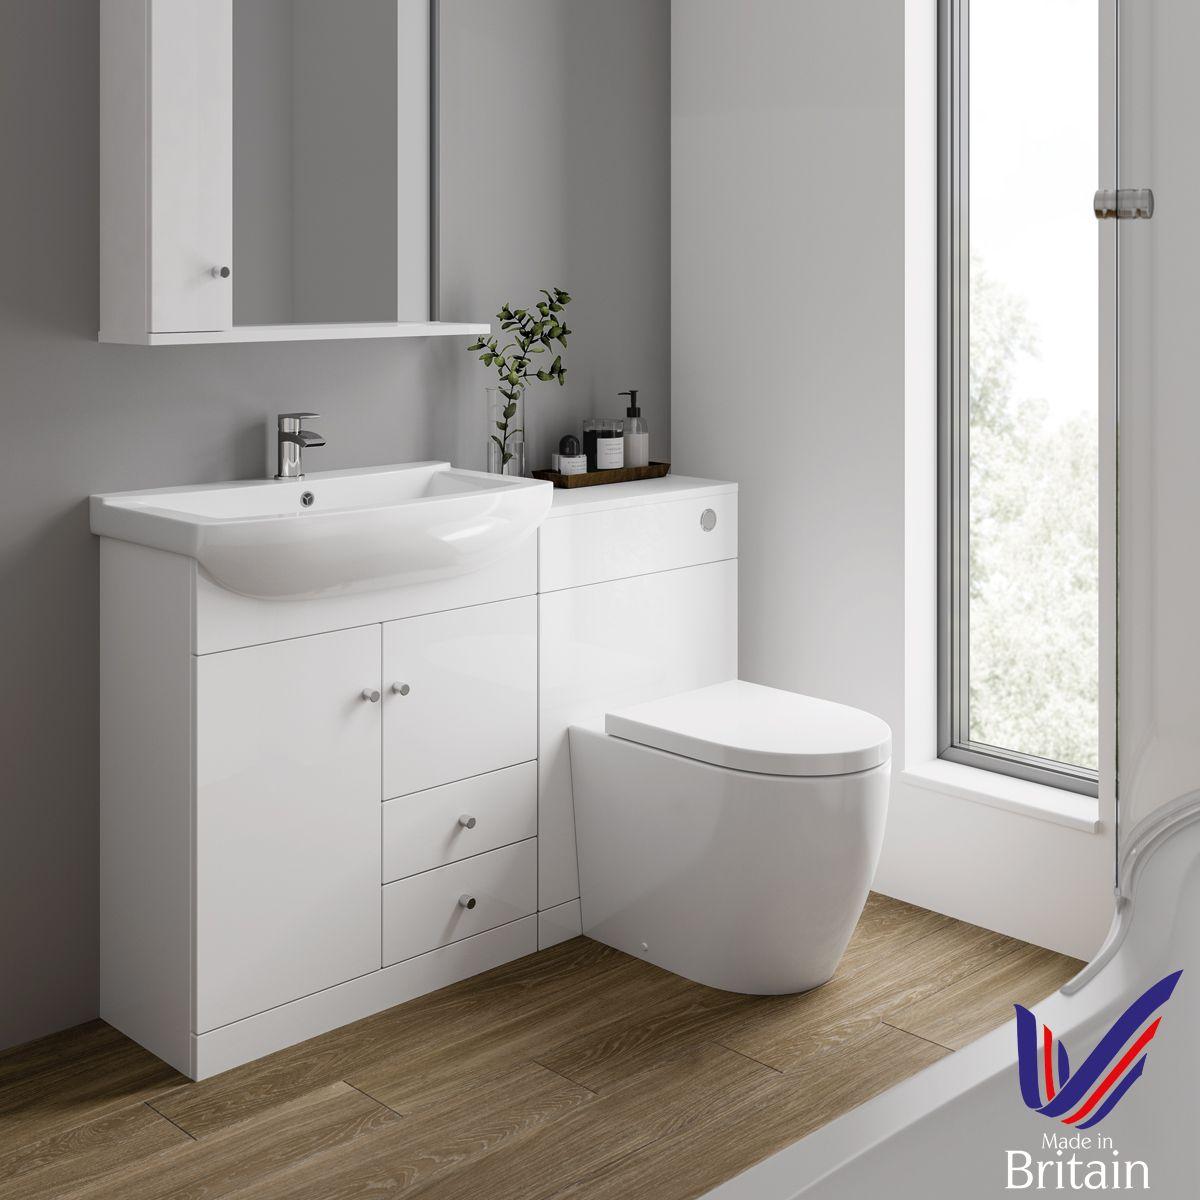 Ikoma White Gloss Vanity Unit with Basin 550mm Lifestyle